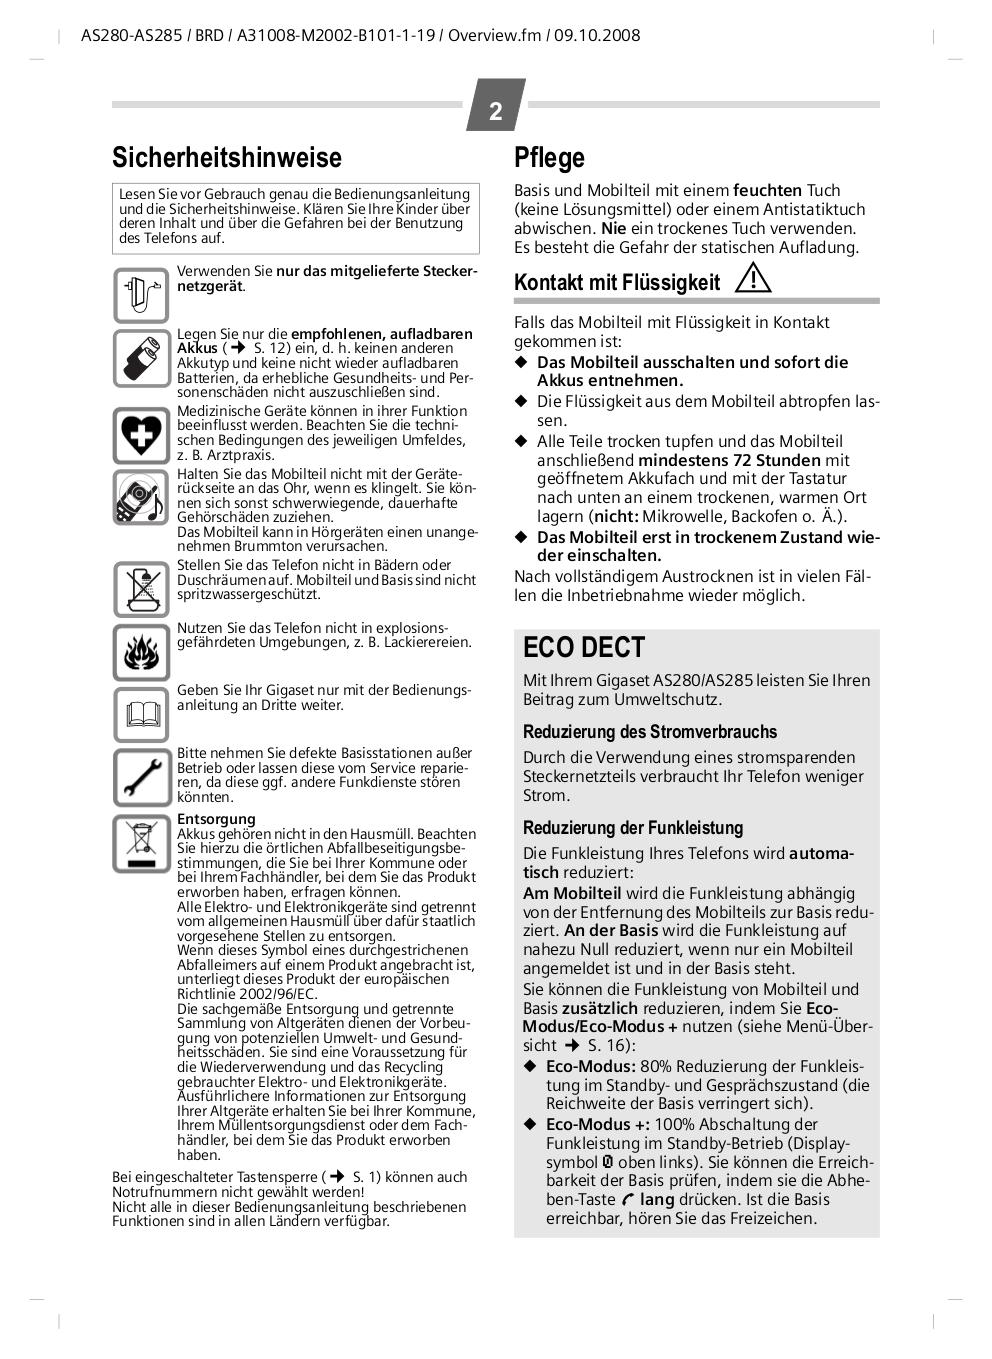 PDF manual for Siemens Telephone Gigaset C285-2